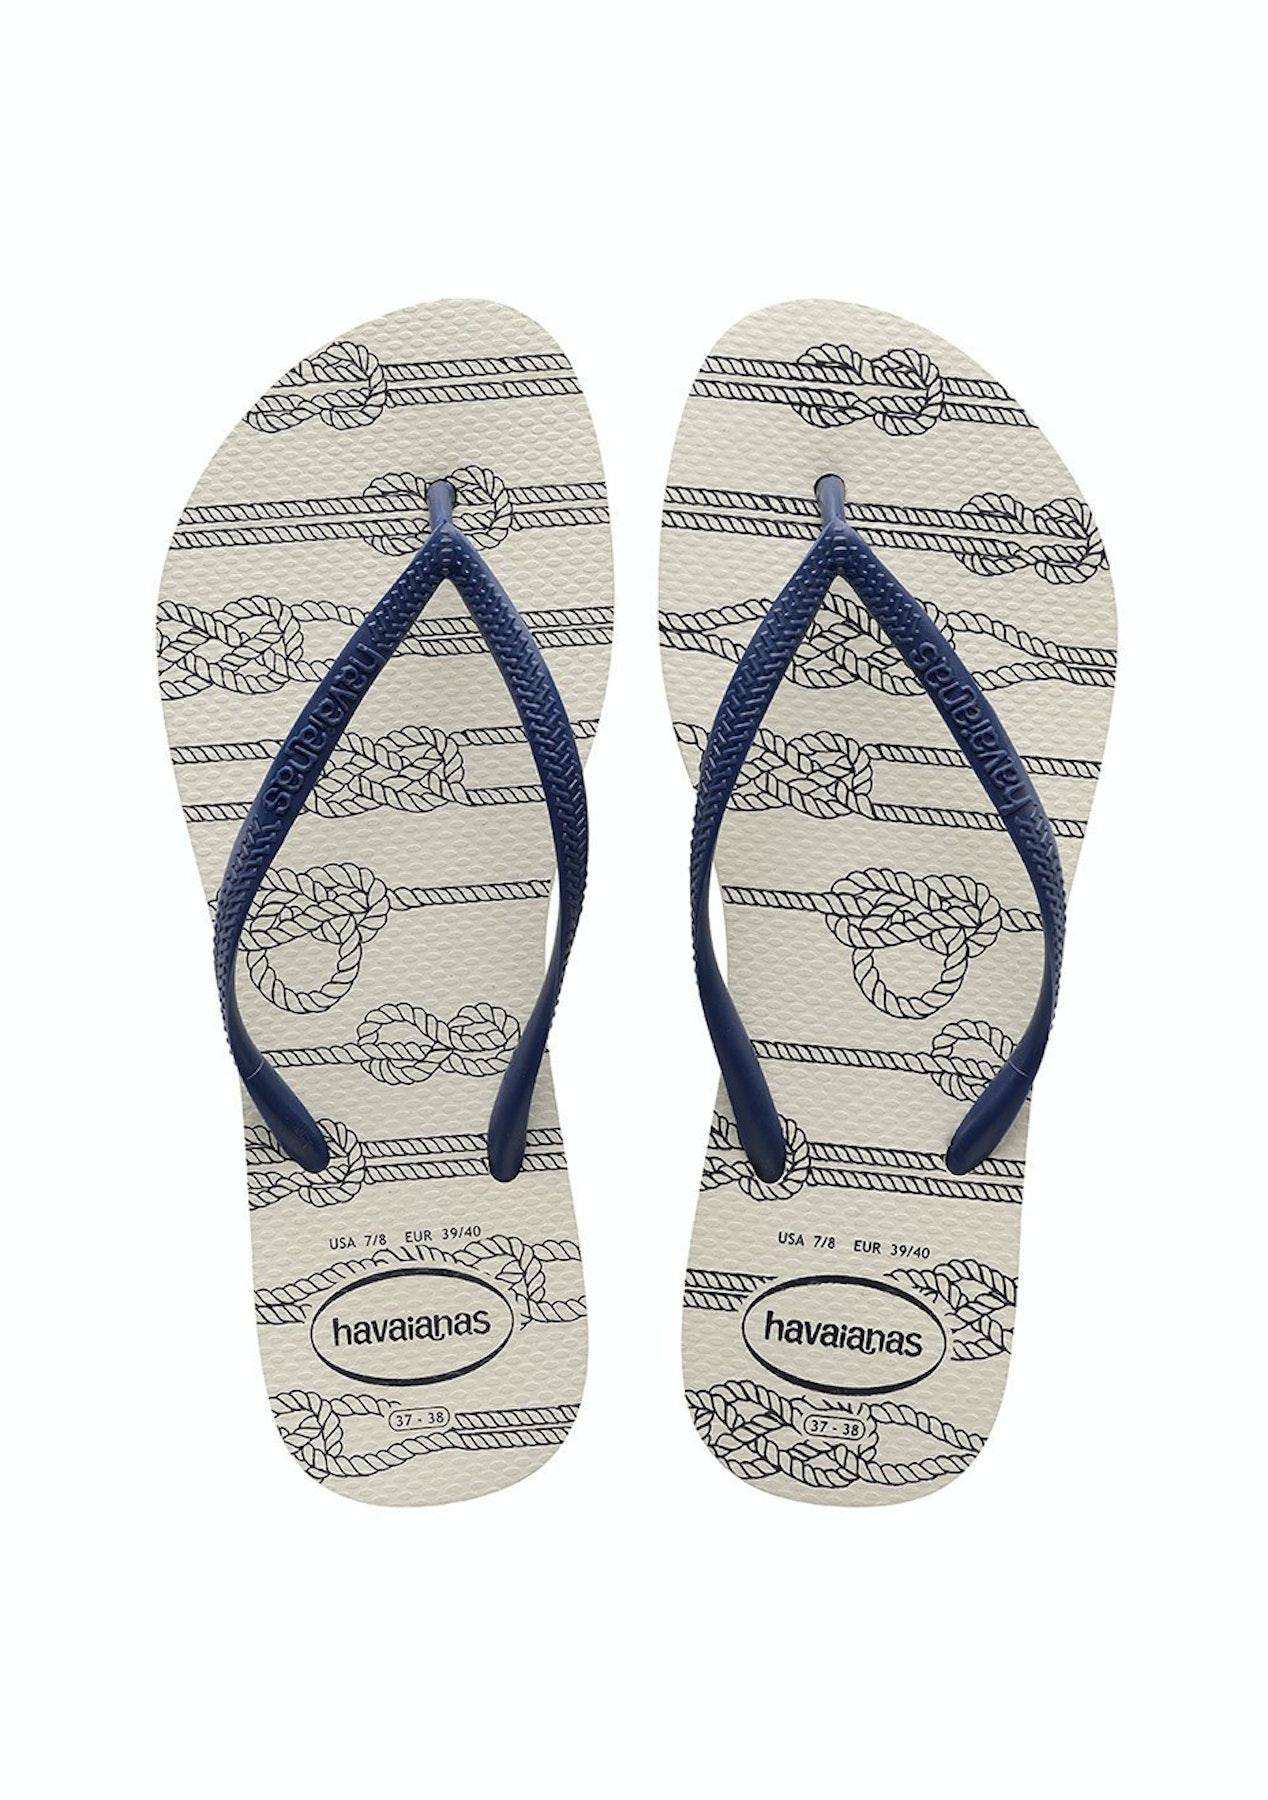 brand new fantastic savings new styles Havaianas - Slim Nautical 0001 - White - Summer Slides and ...